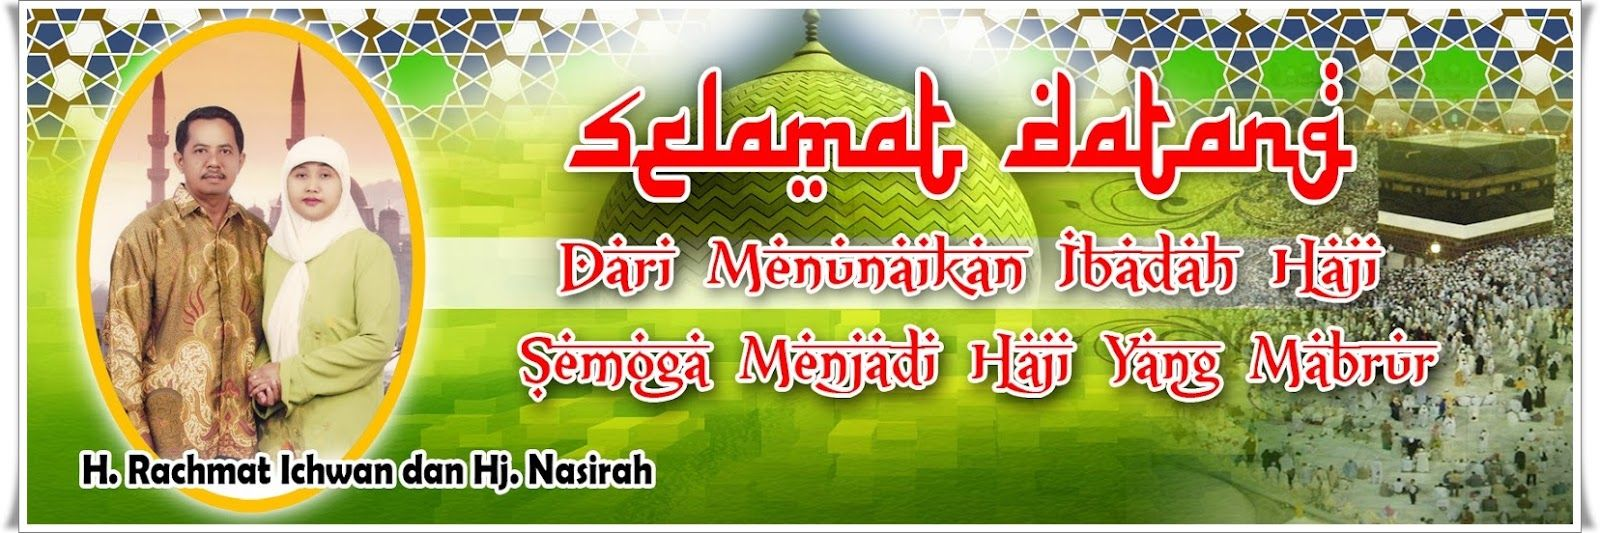 Contoh Ucapan Selamat Untuk Orang Pulang Haji Wallpaper Keren